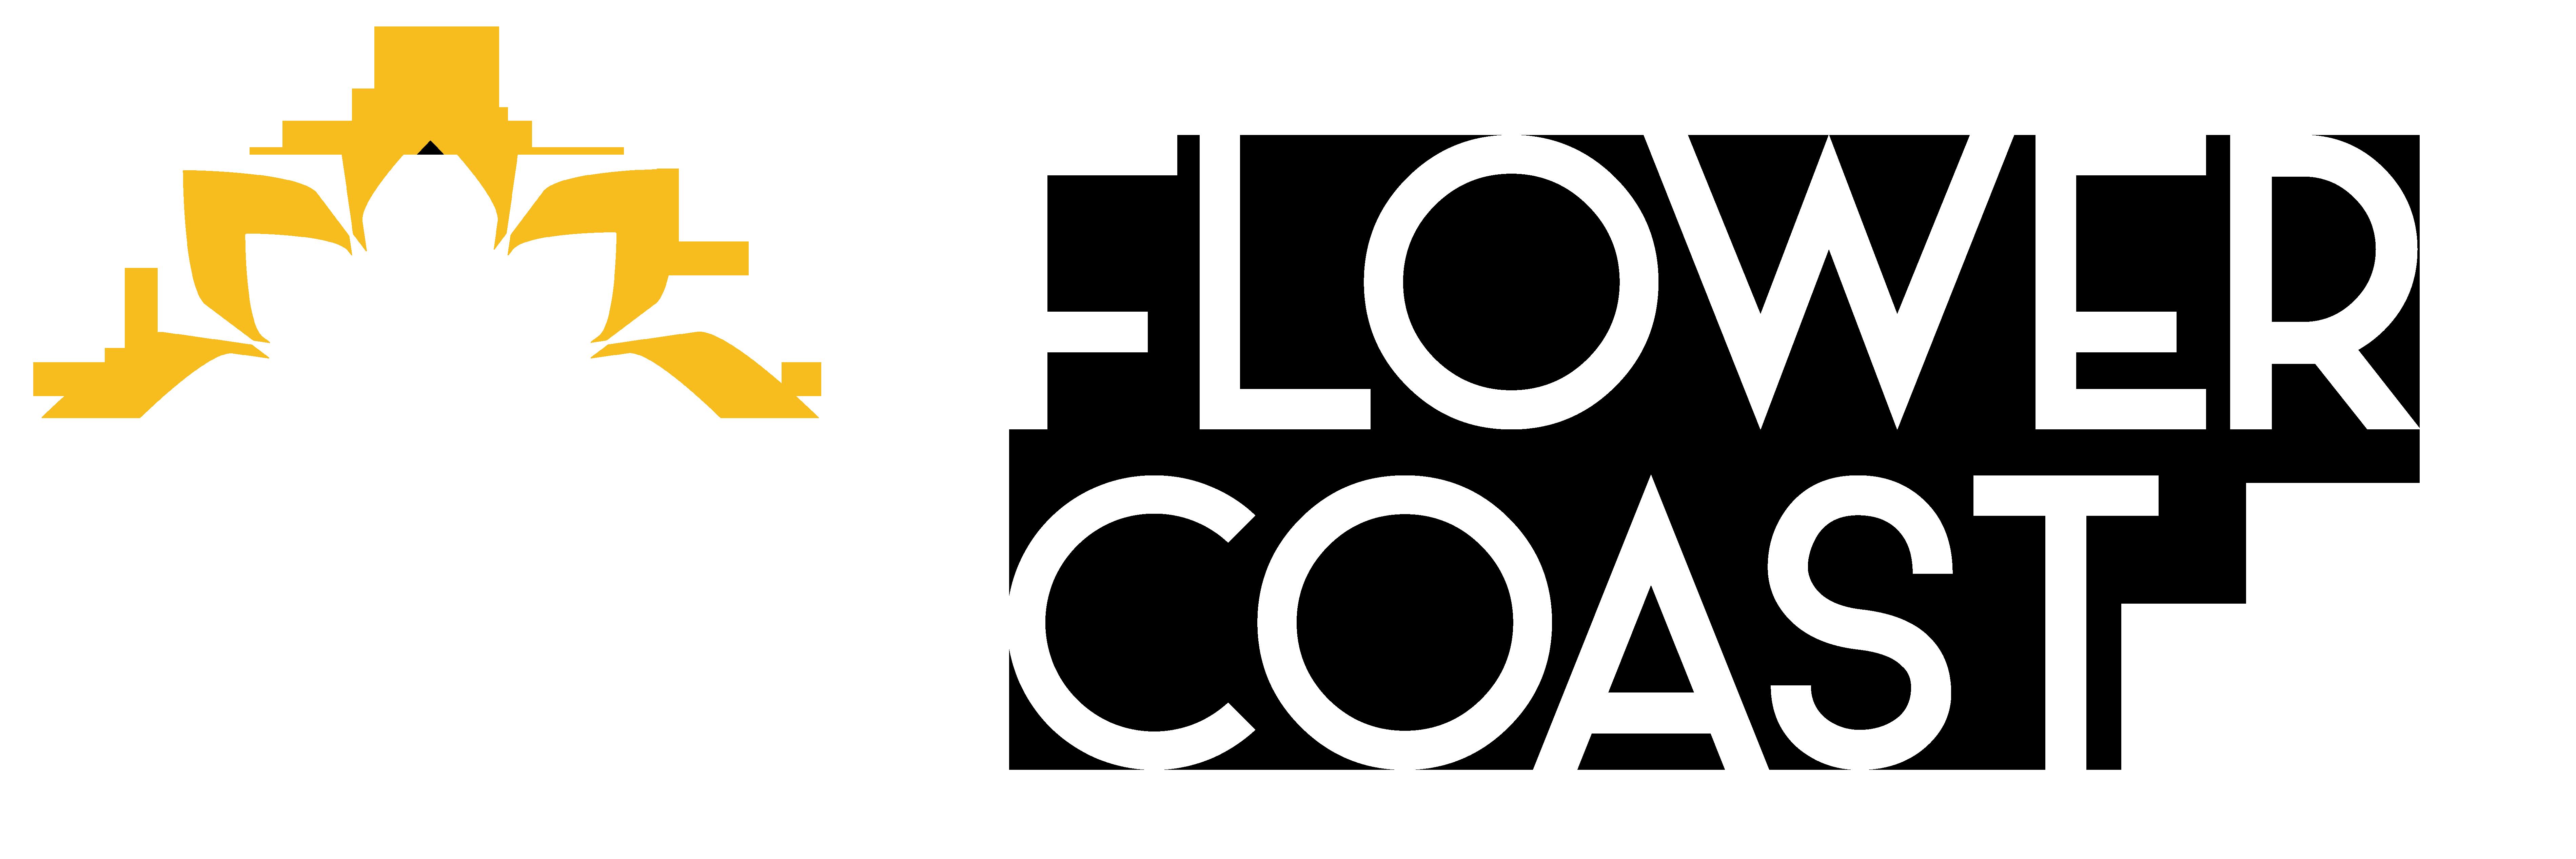 Flower Coast Logo